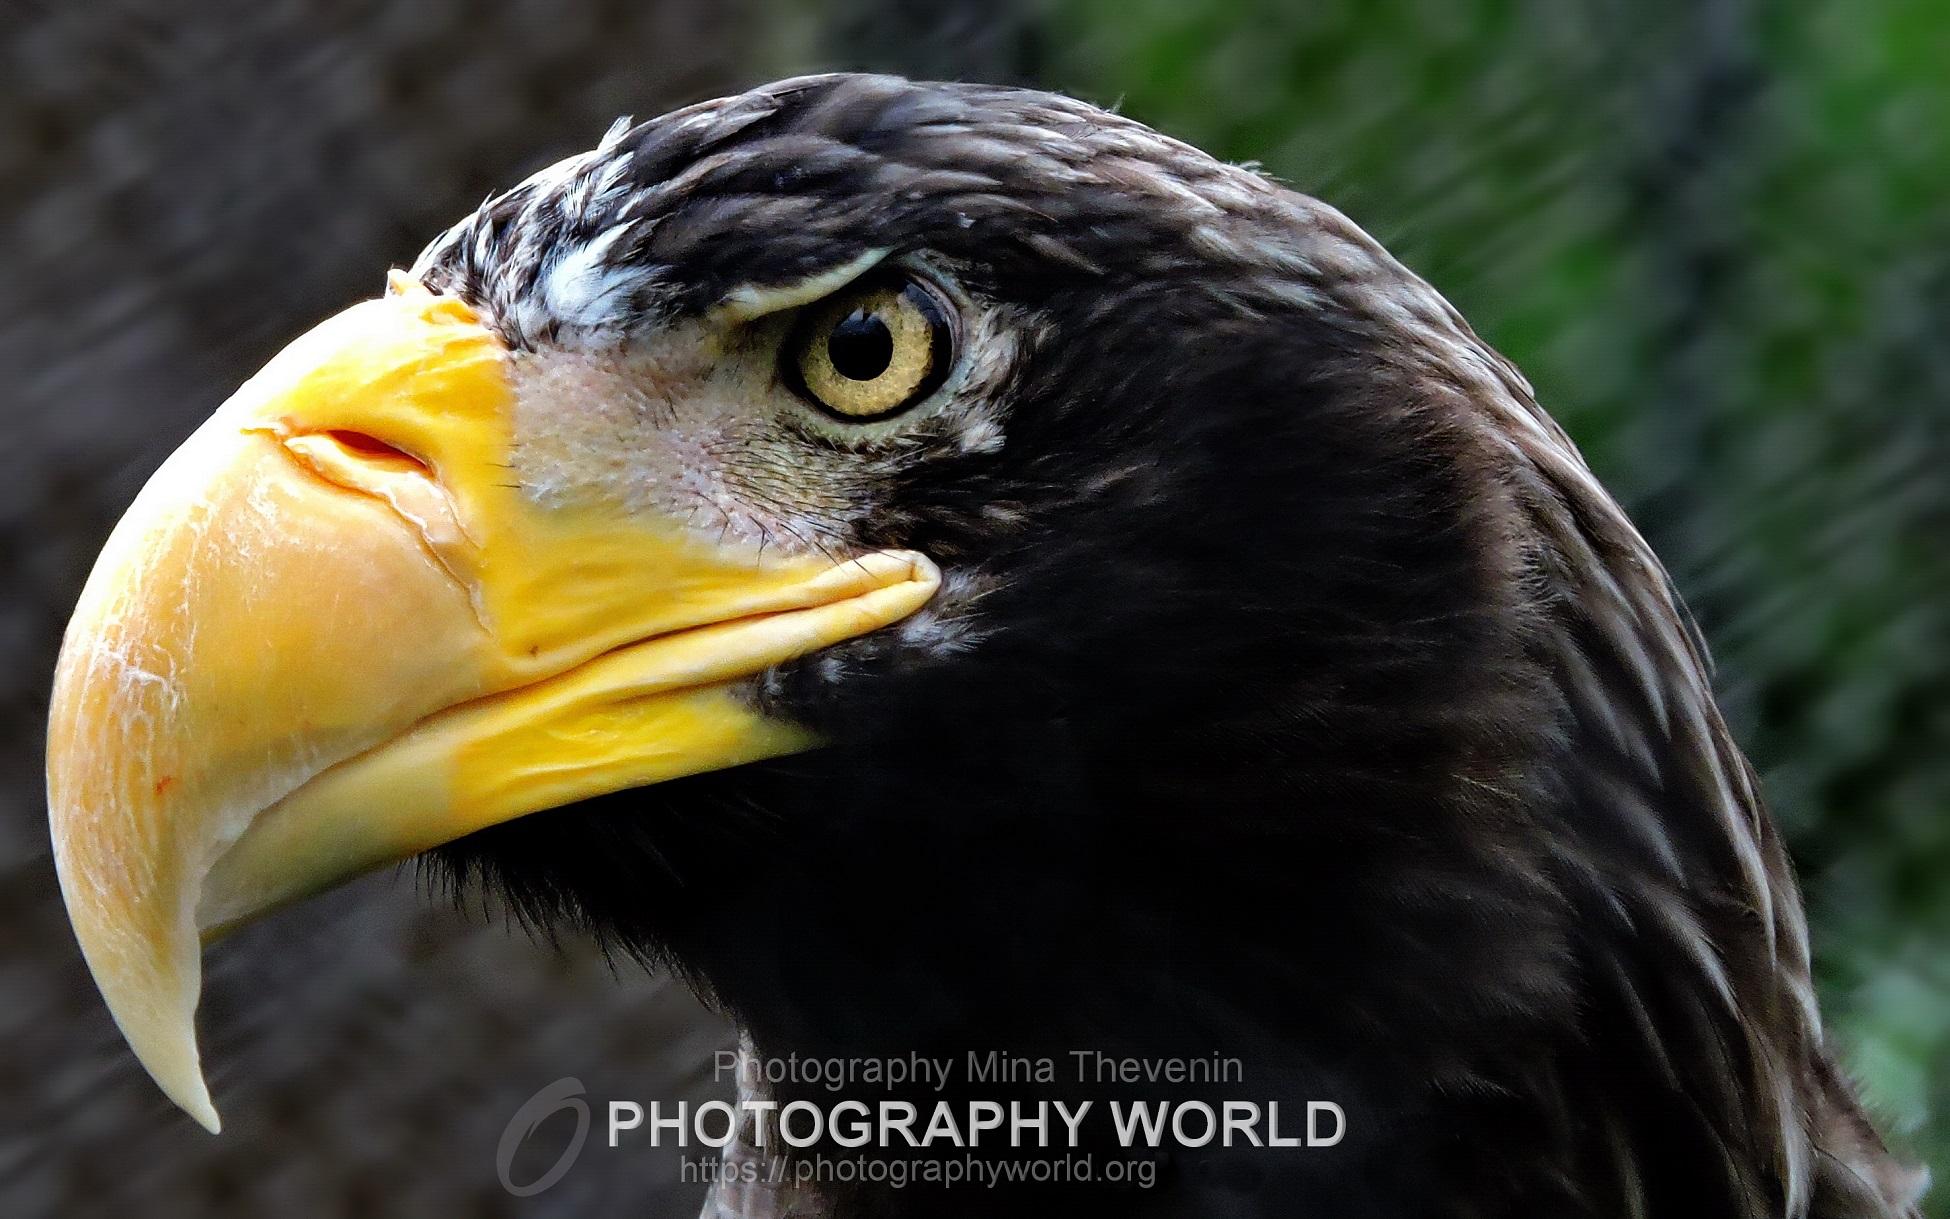 © Steller's Sea Eagle. Photograph by Mina Thevenin for photographyworld.org